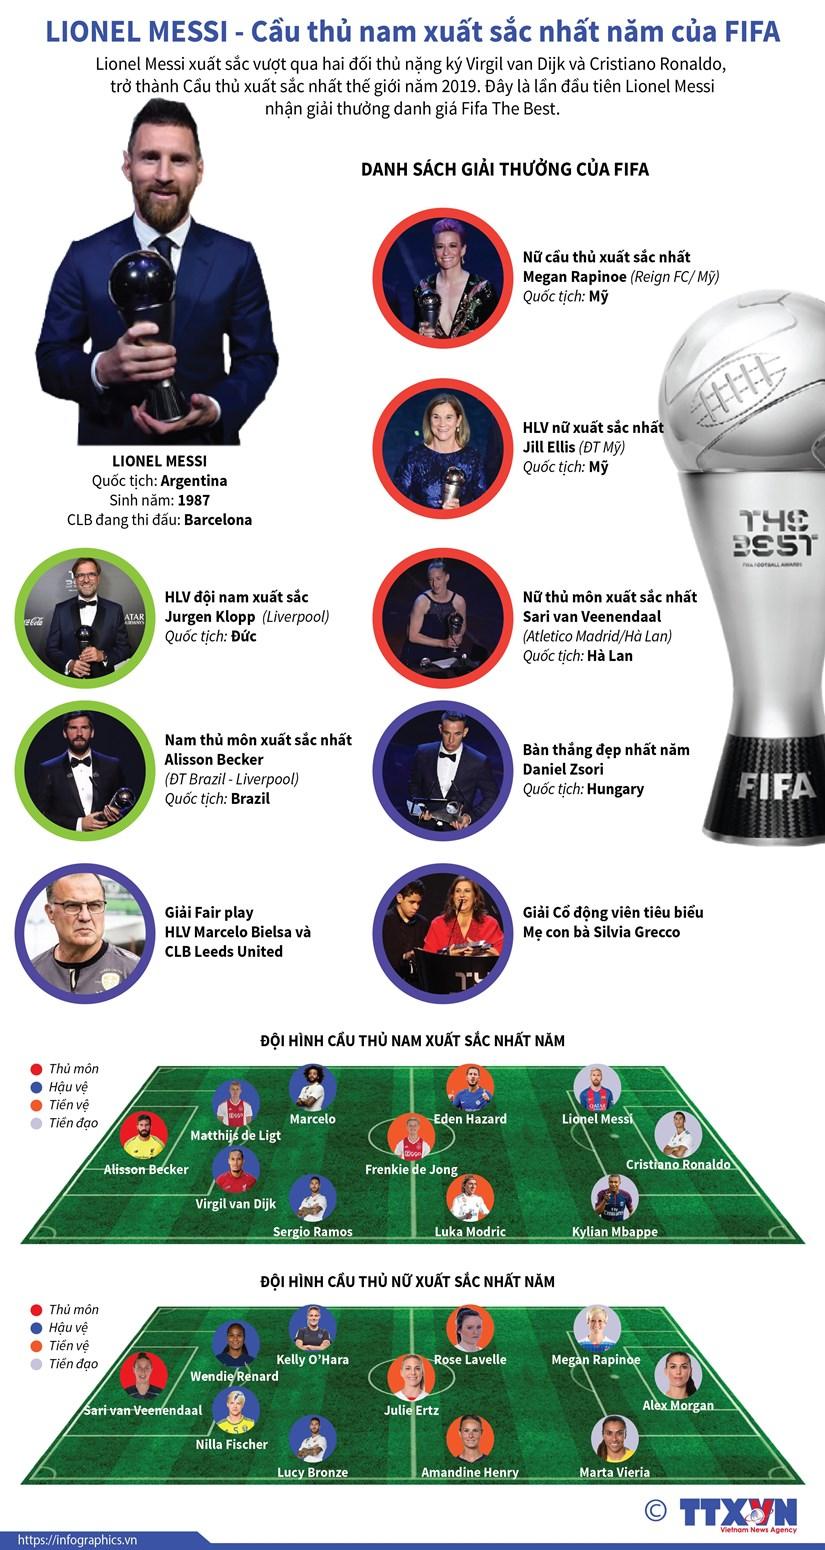 [Infographics] Lionel Messi - Cau thu nam xuat sac nhat nam cua FIFA hinh anh 1